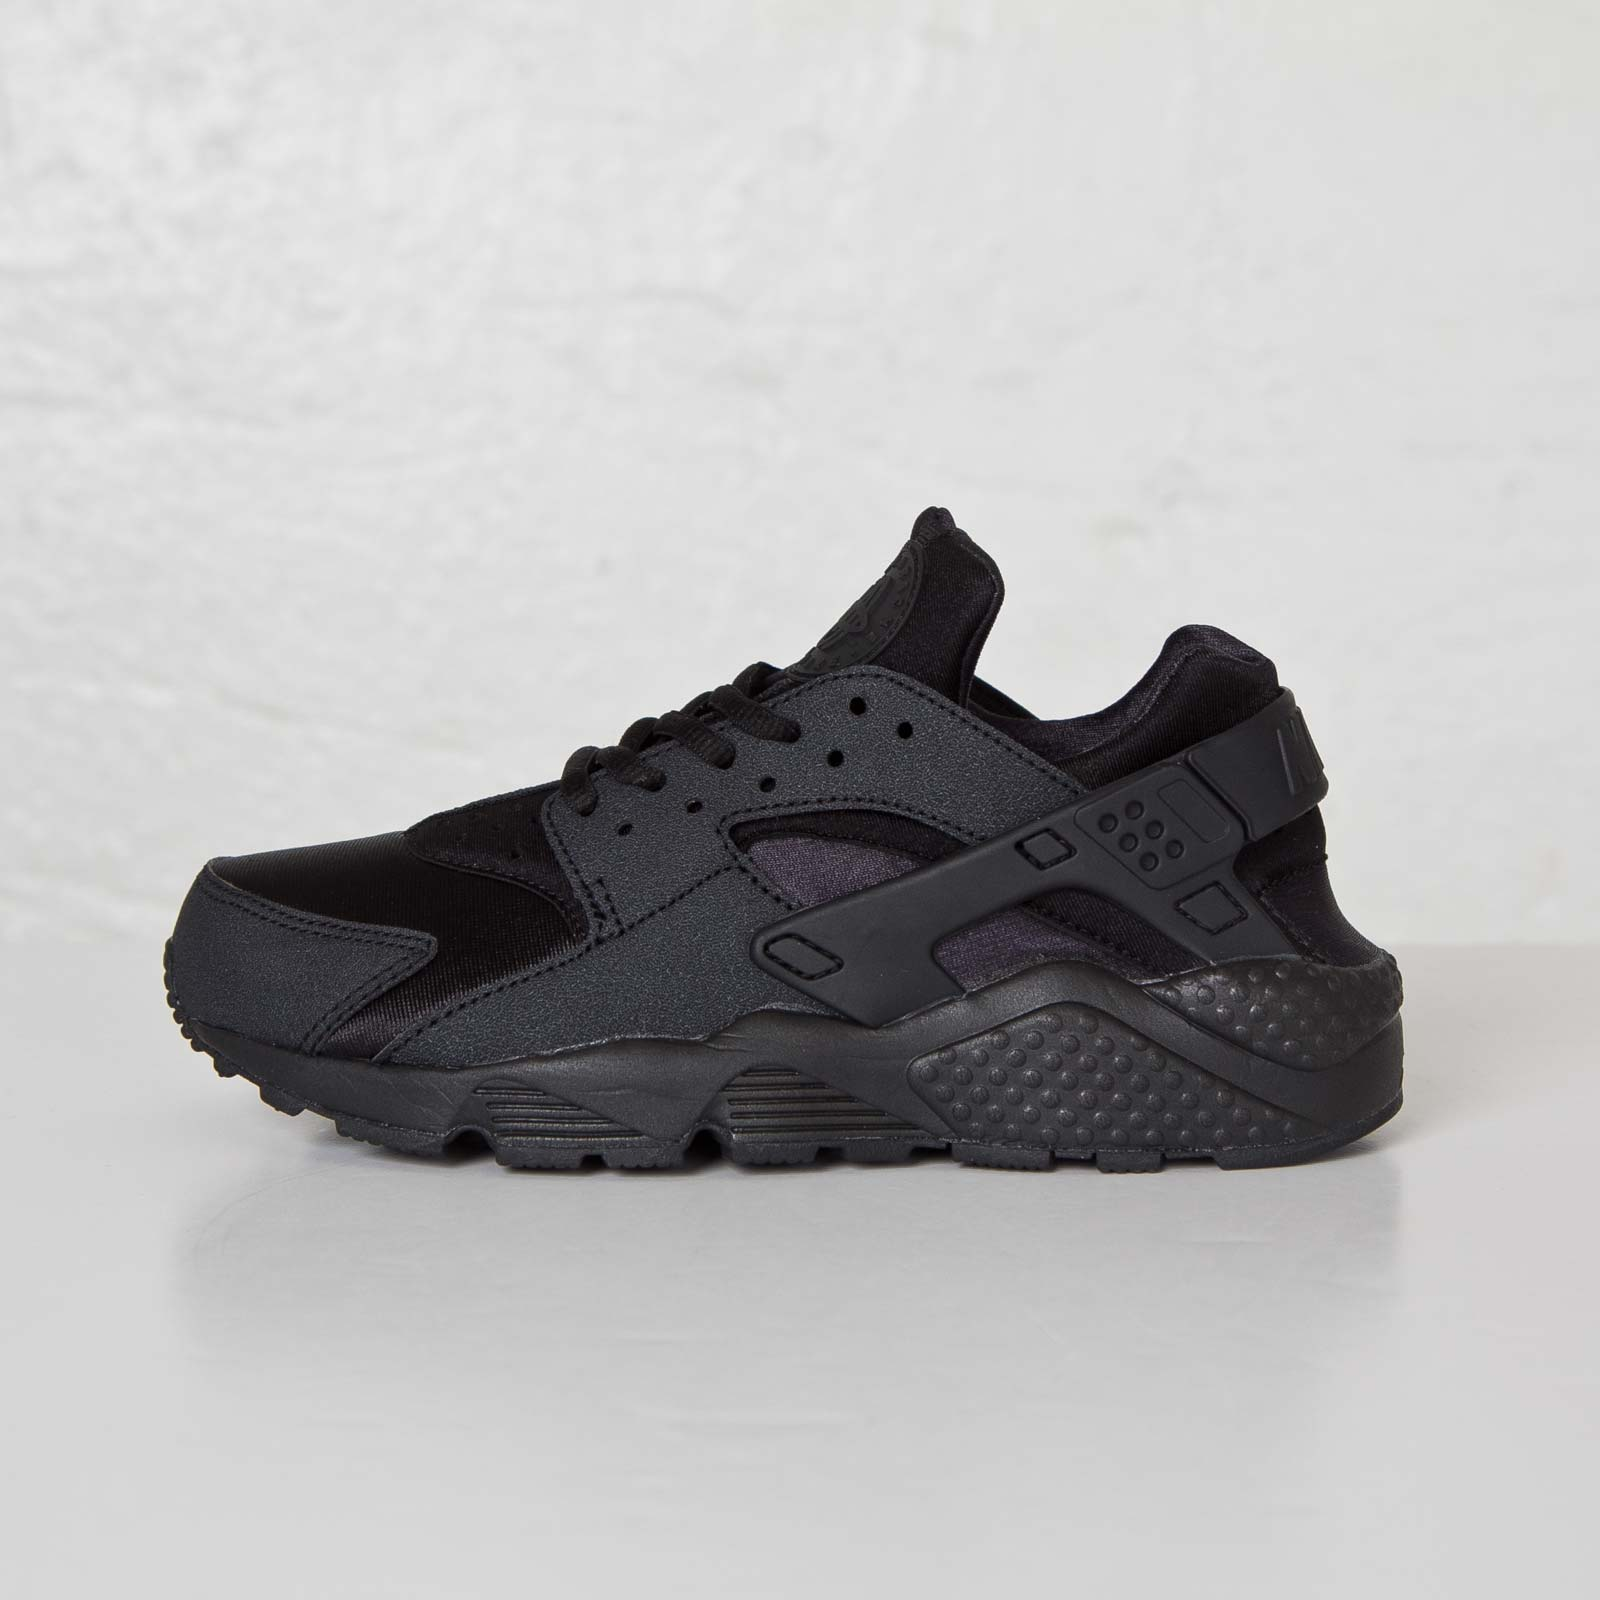 promo code ed96e 49f83 Nike Wmns Air Huarache Run - 634835-009 - Sneakersnstuff   sneakers    streetwear online since 1999